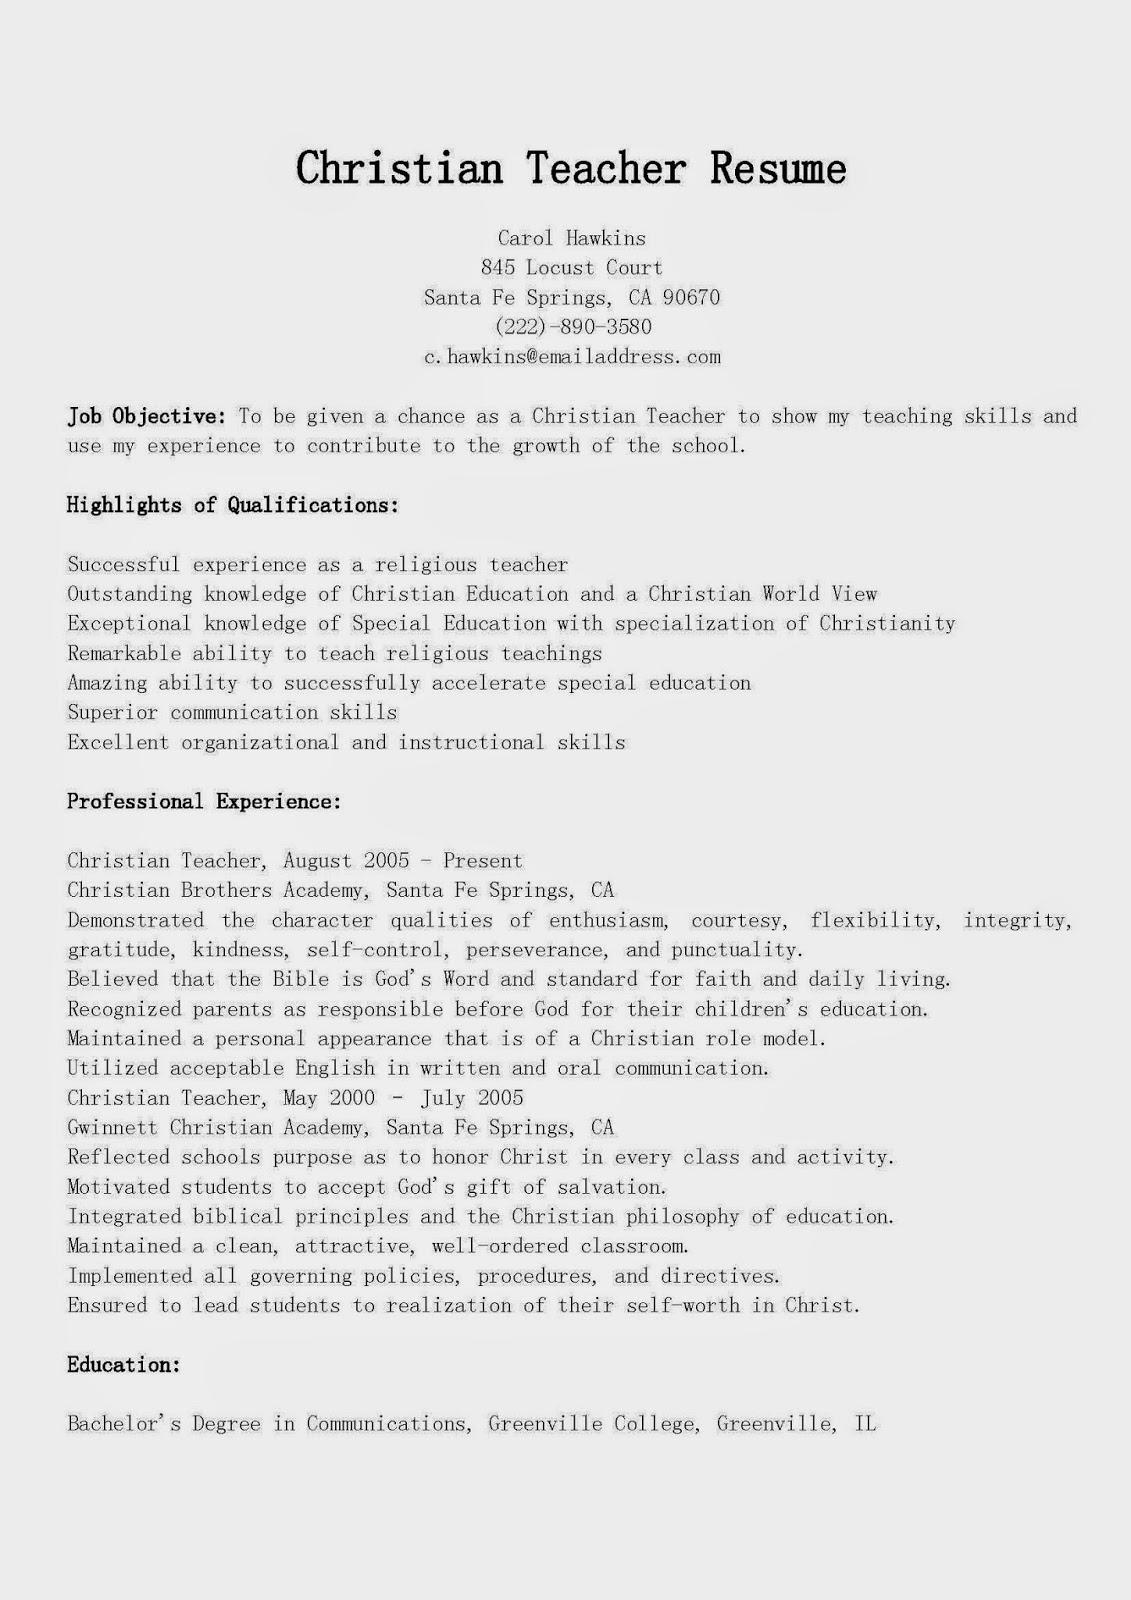 resume formatting cerescoffee co real estate developer